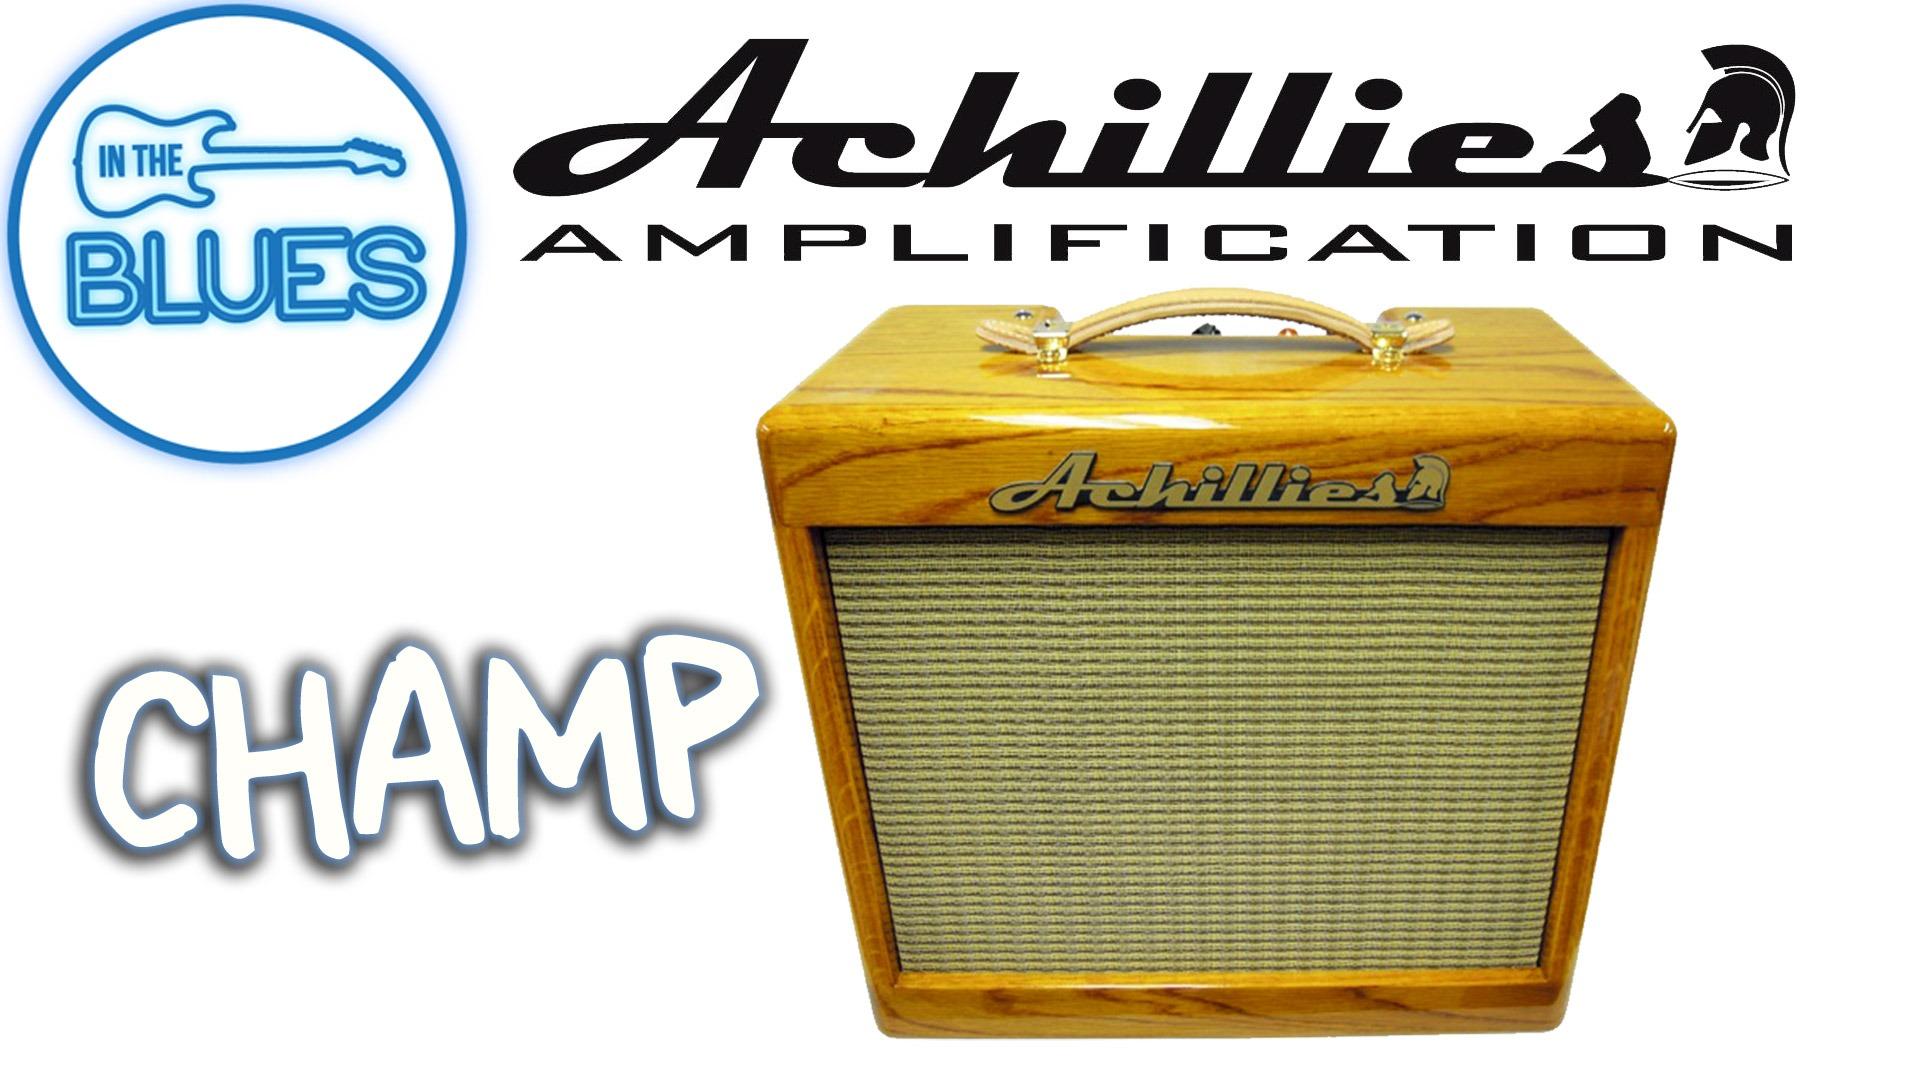 Achillies Champ Amplifier